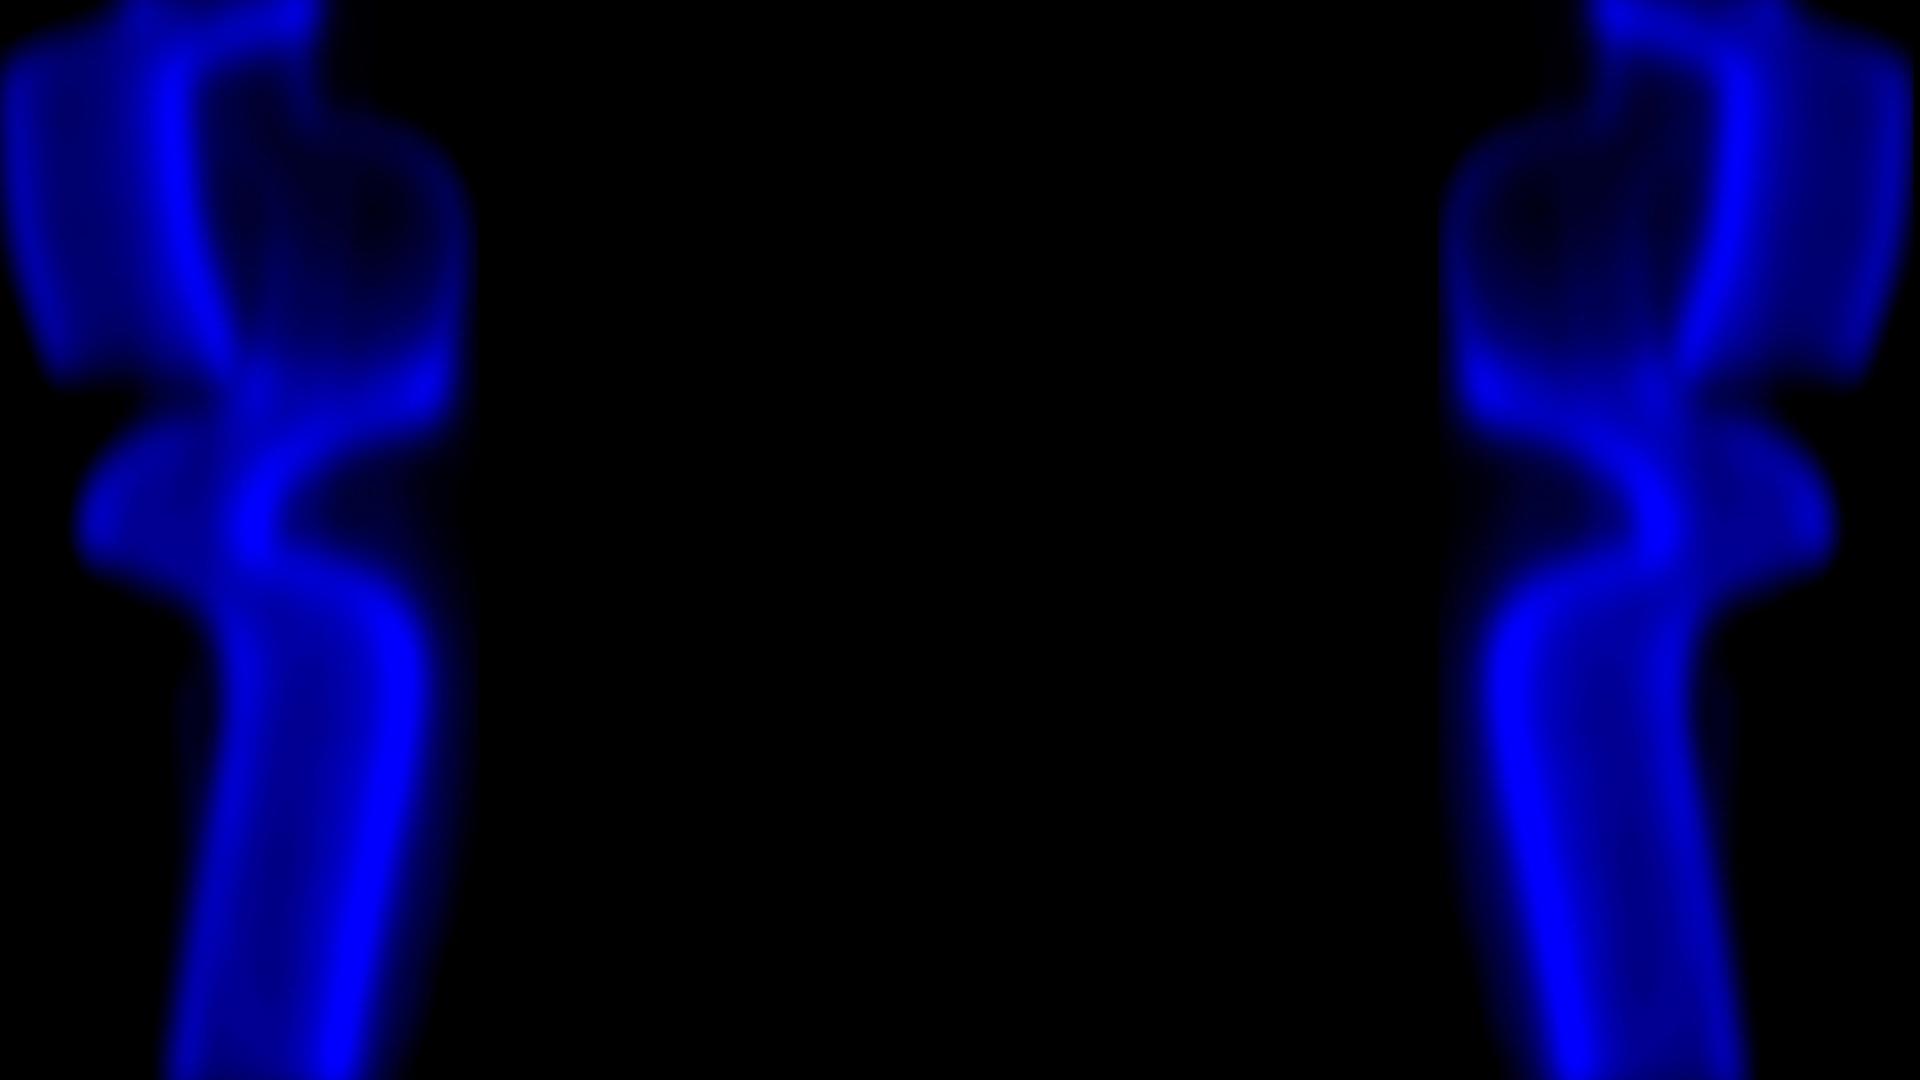 Sorrow- Blue Lines Narrow 2